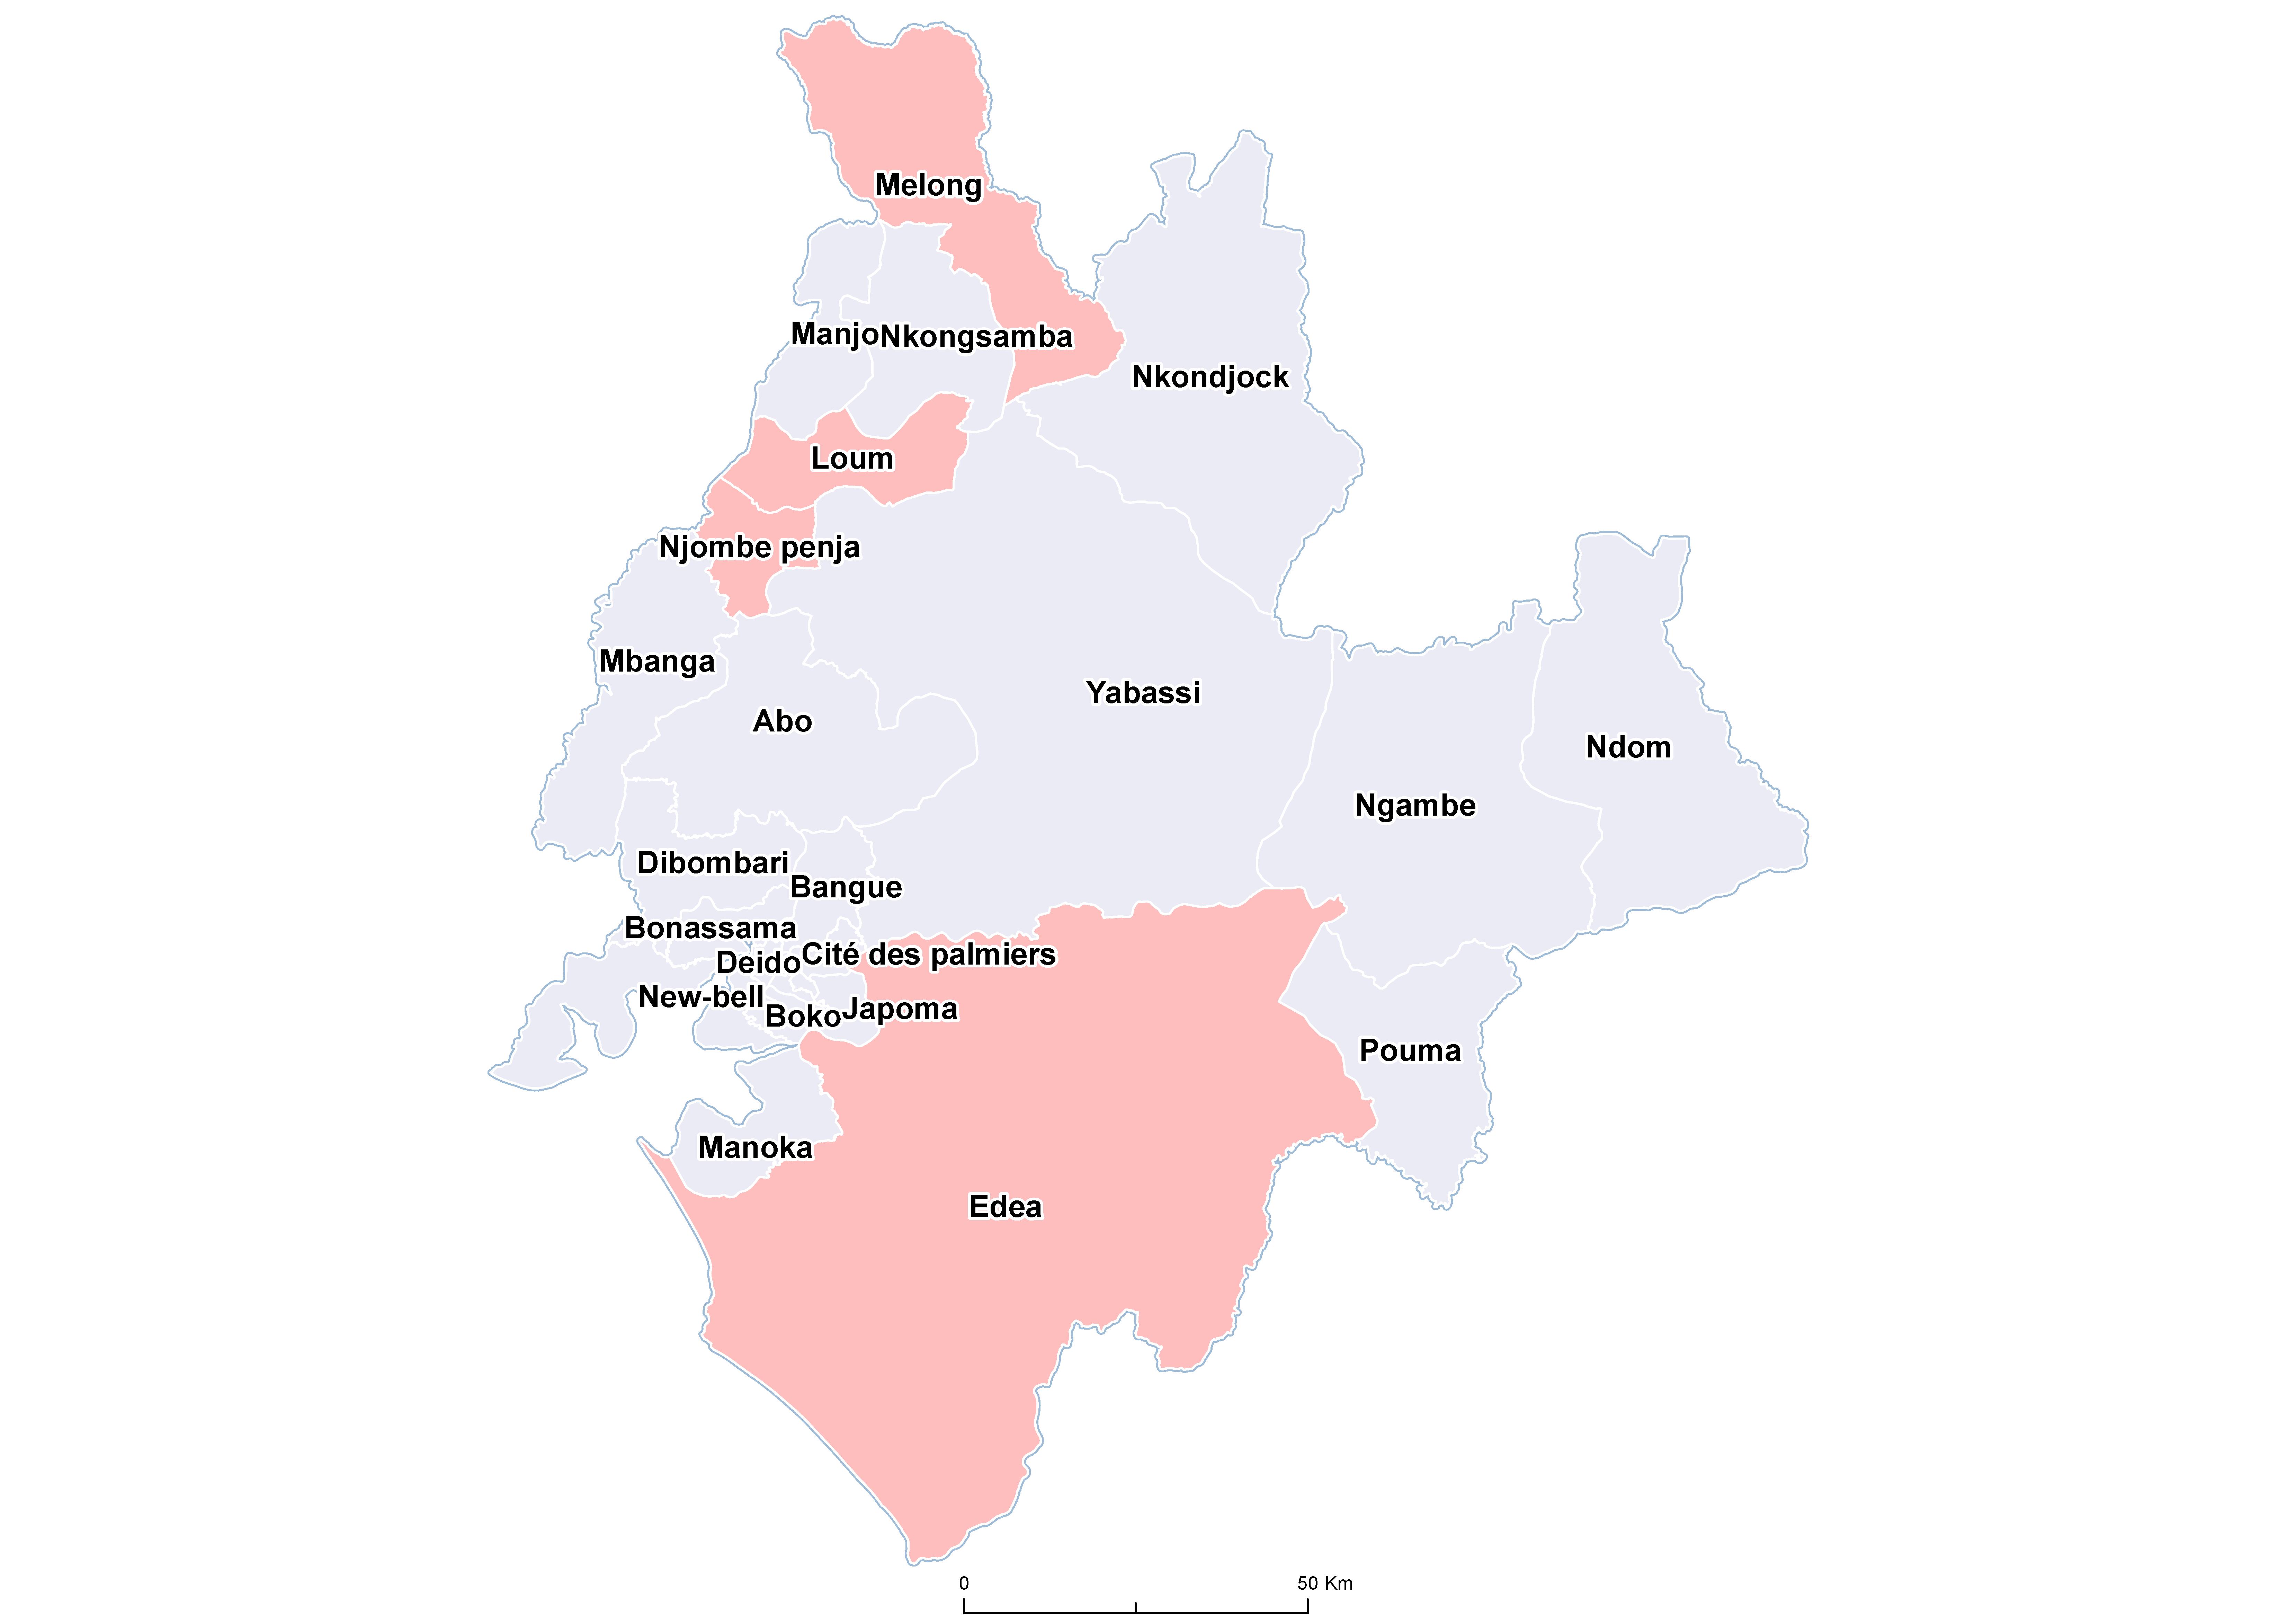 Littoral Mean STH prevalence 20180001